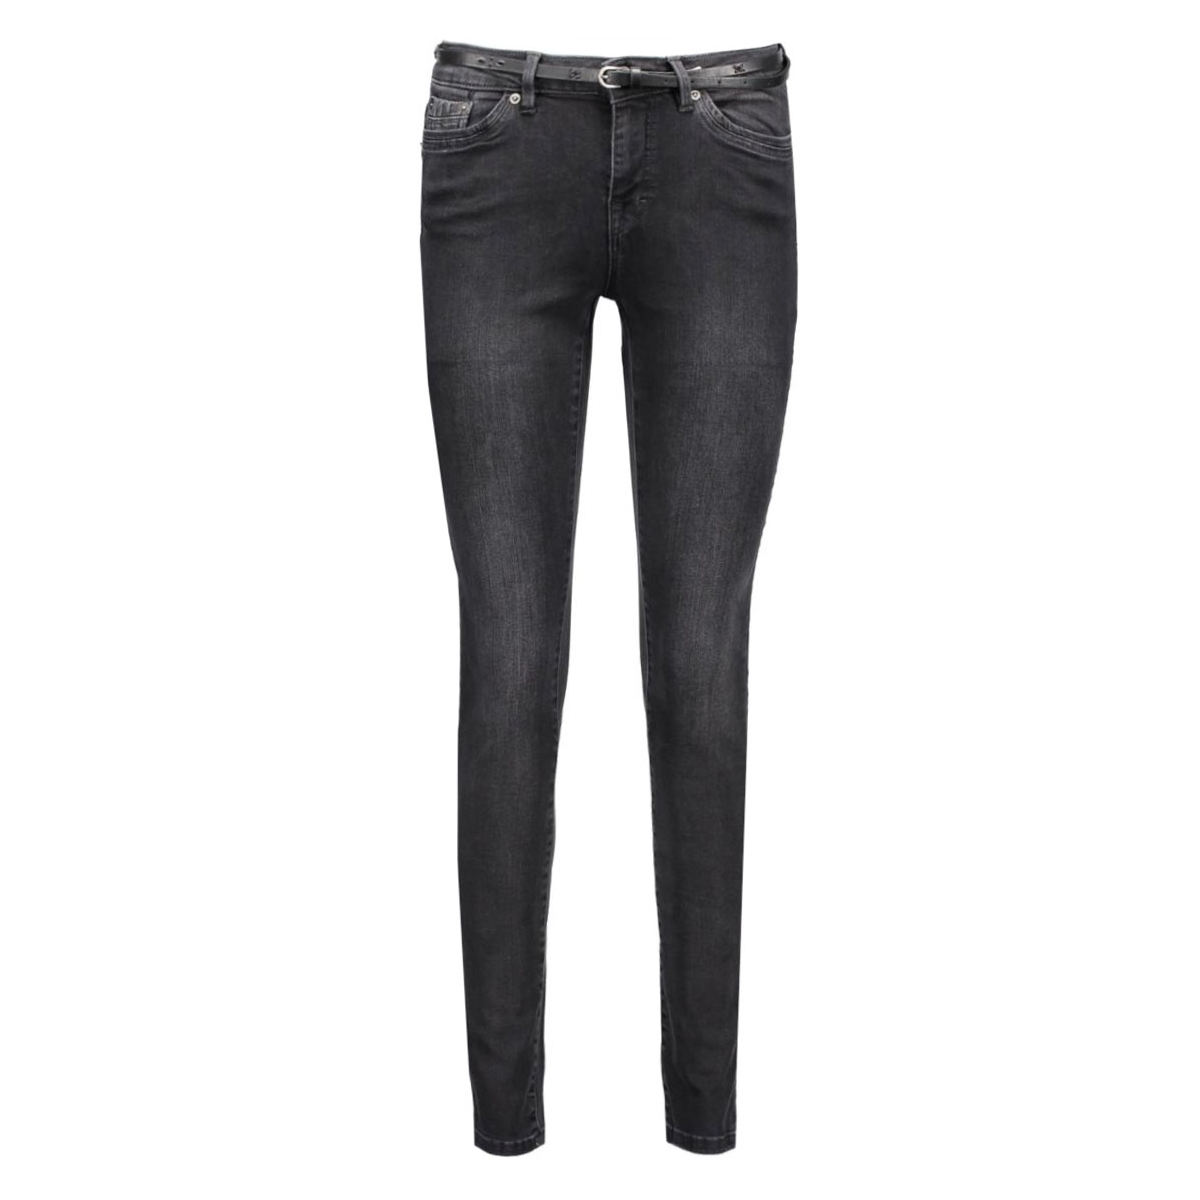 096cc1b020 edc jeans c911